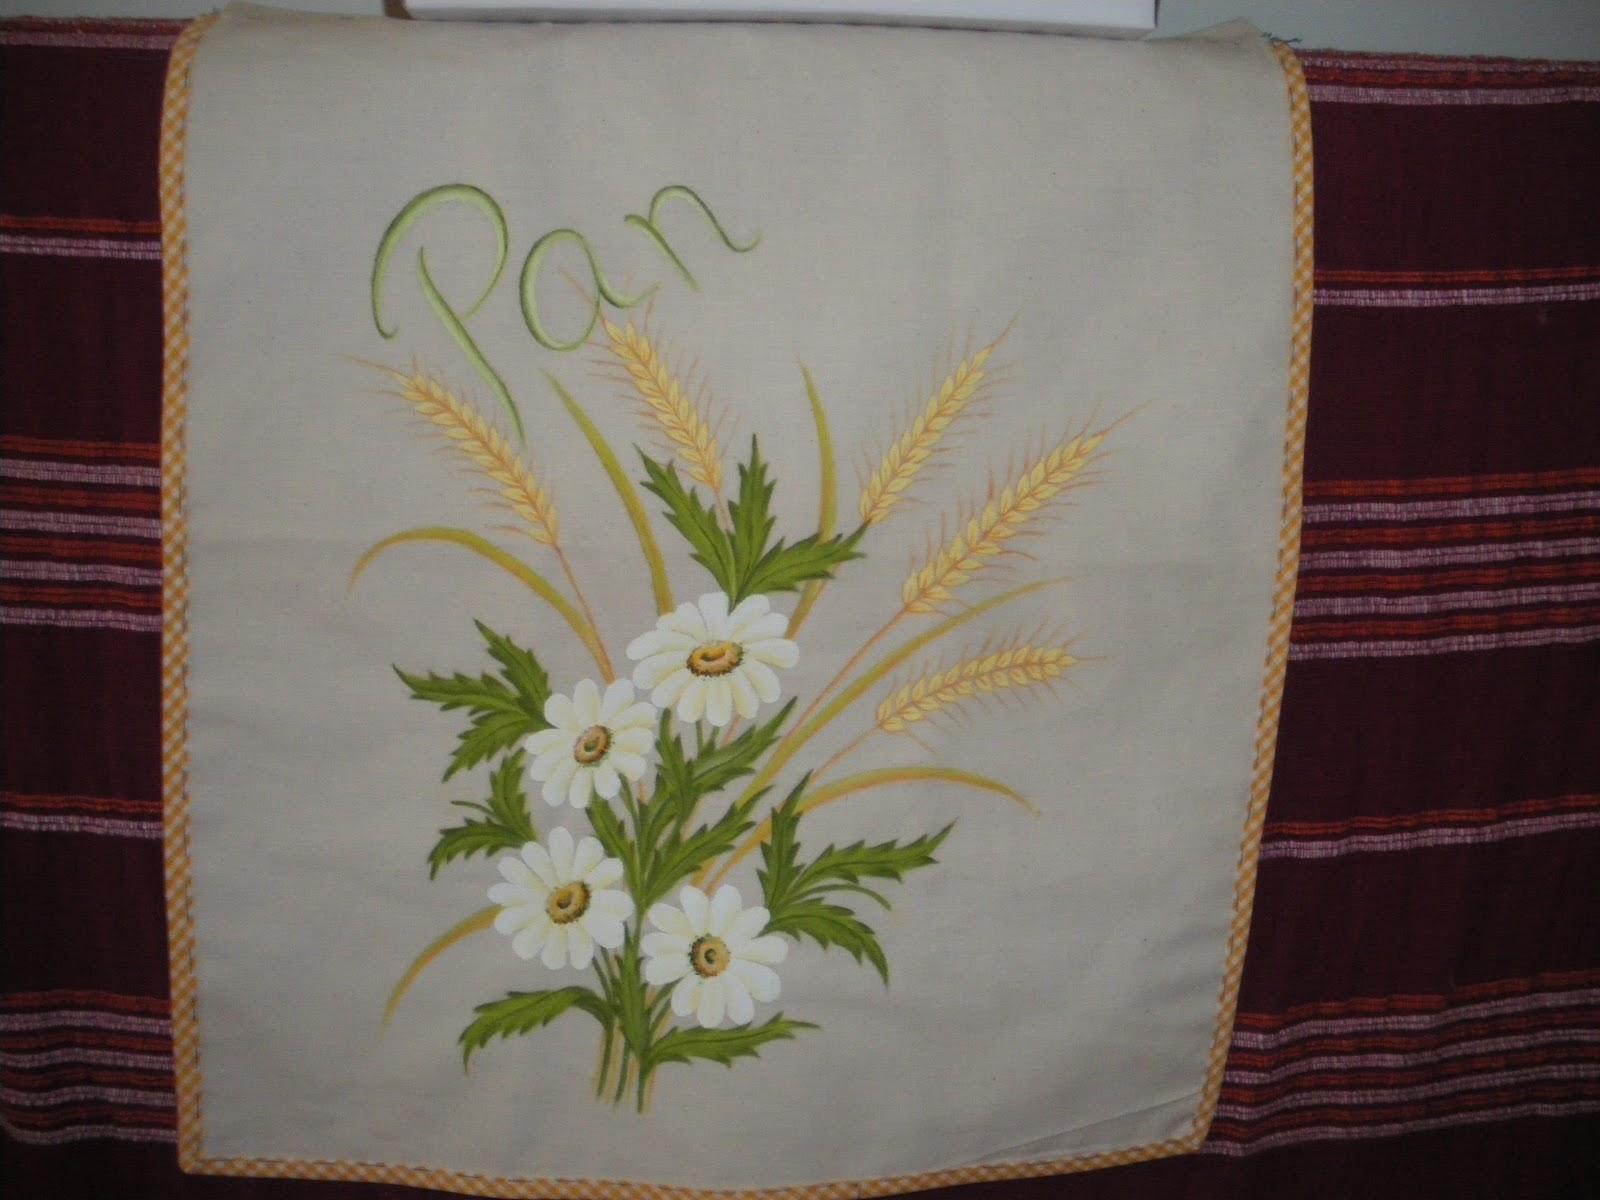 Artesania pintura en tela y manualidades bolsas para el pan - Bolsas para pintar ...